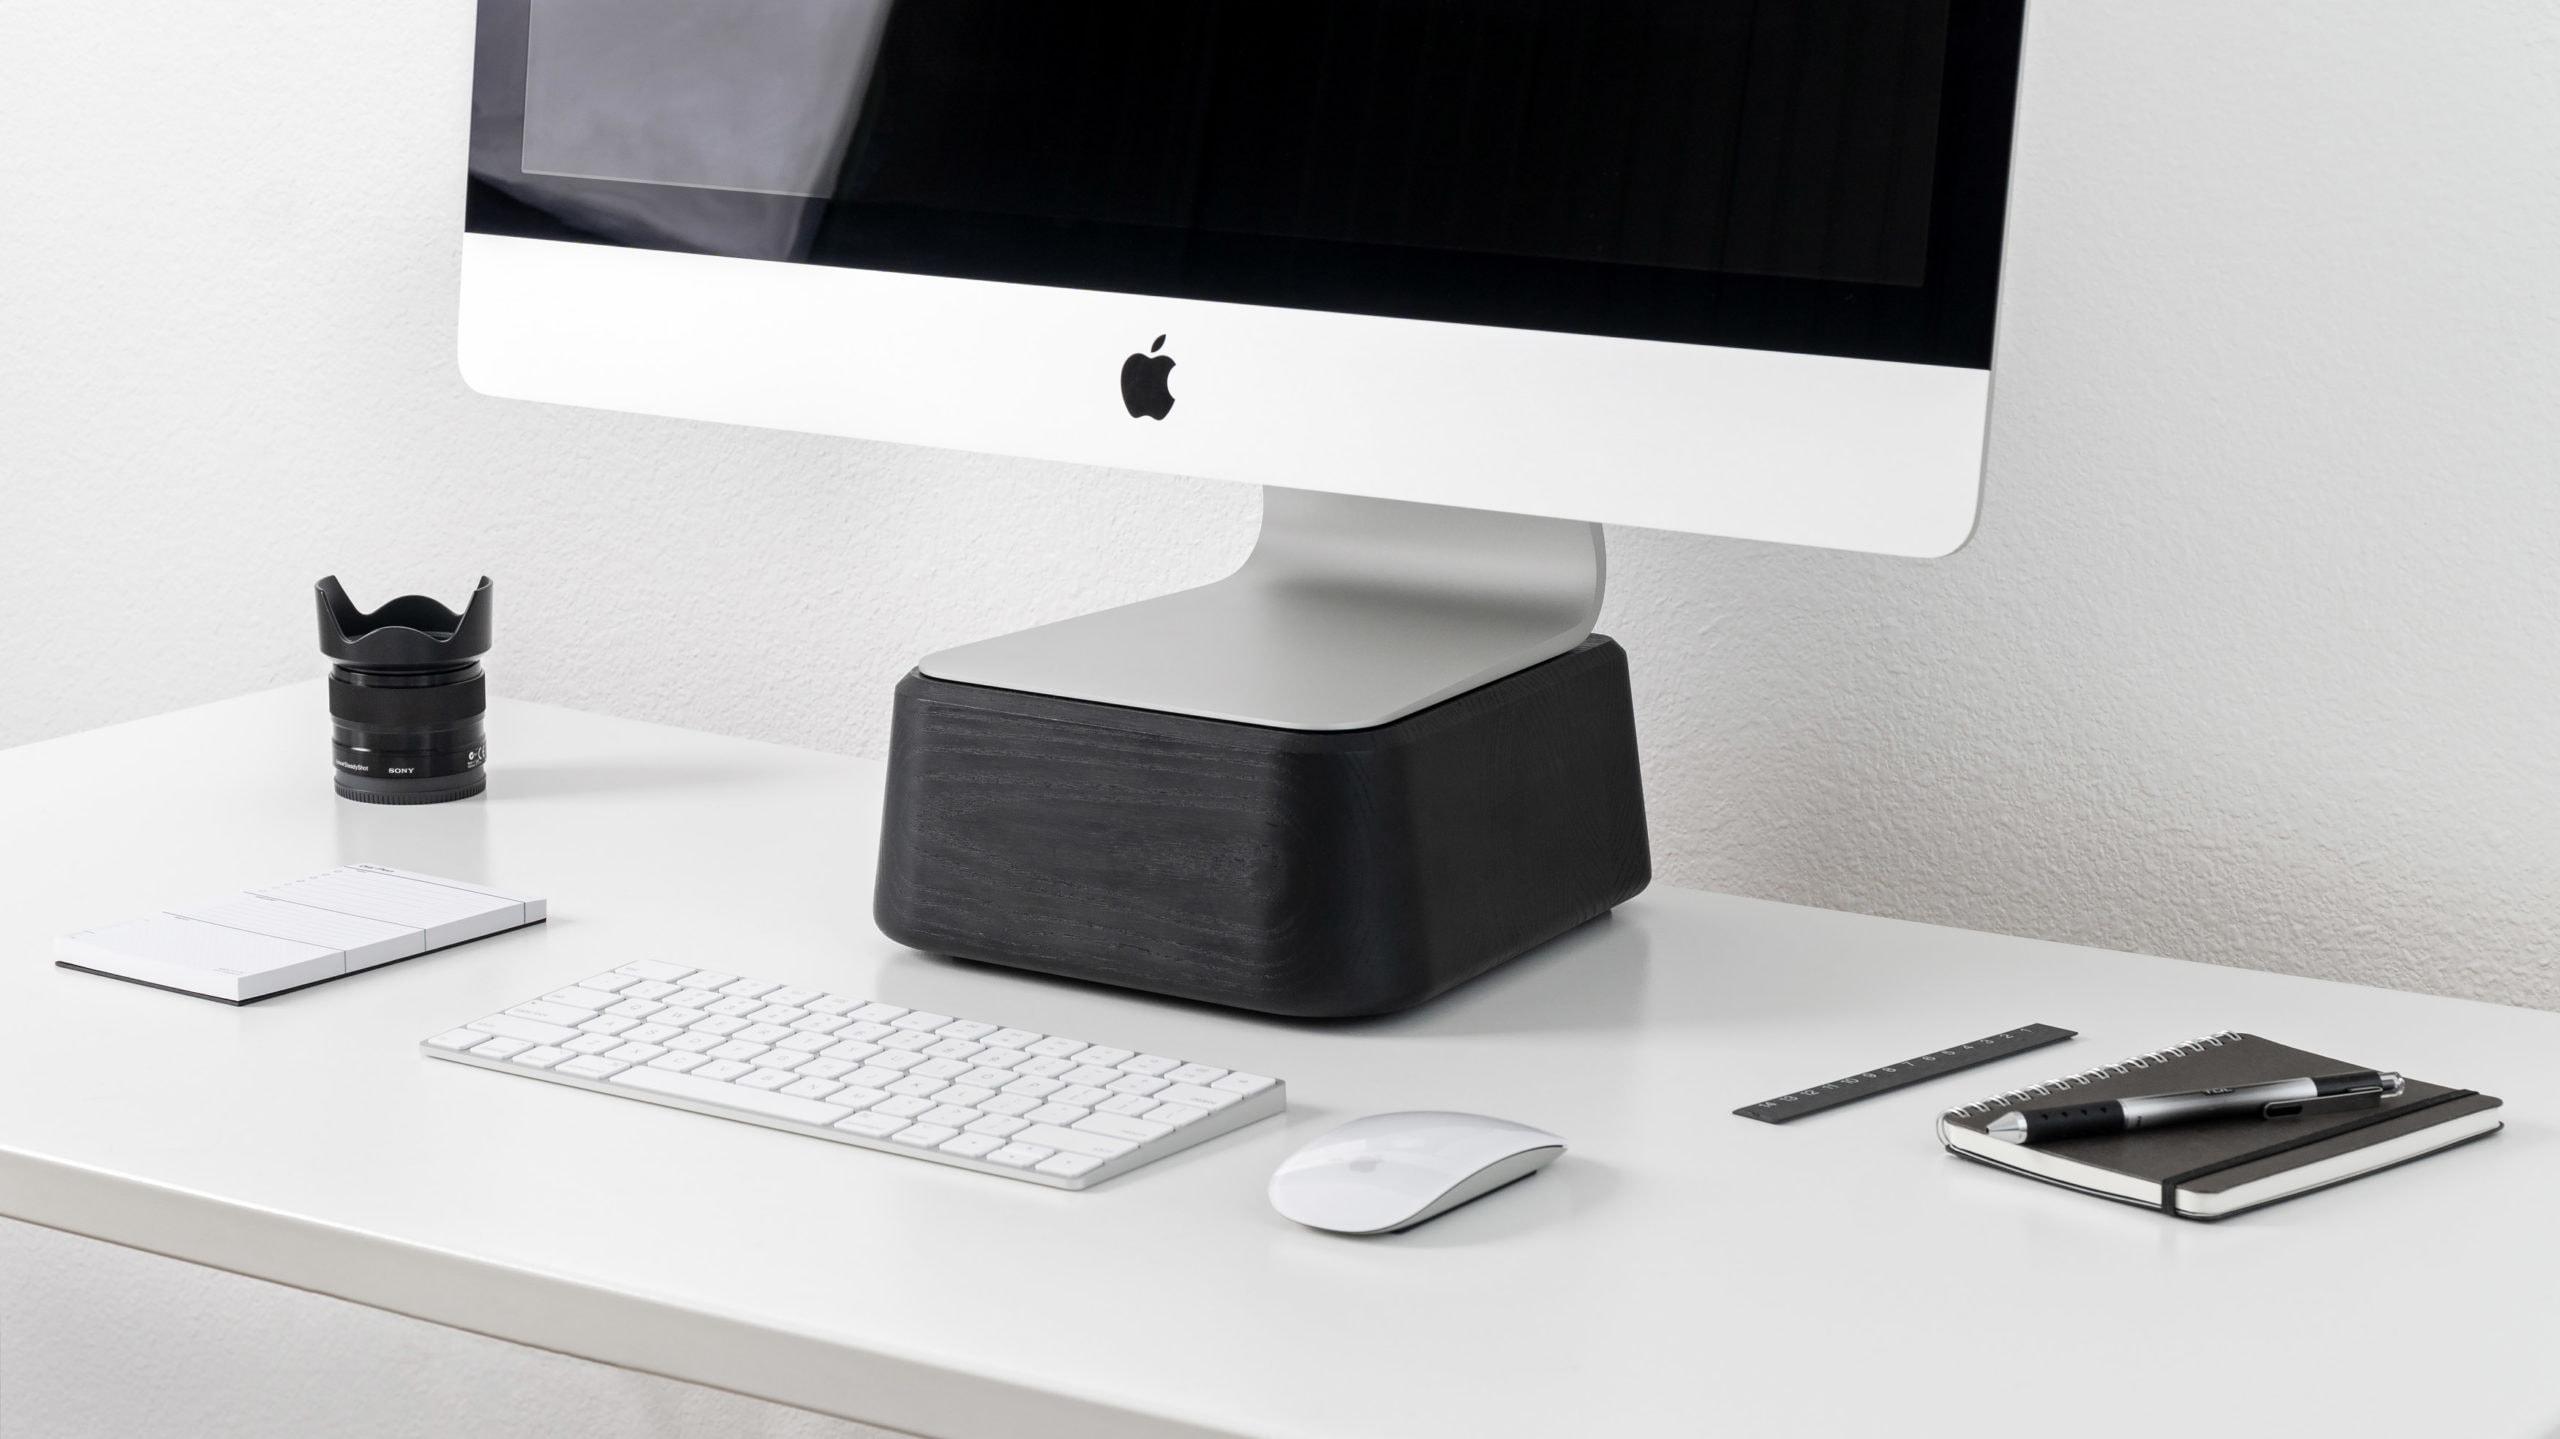 Base for iMac makes your desktop more ergonomic.